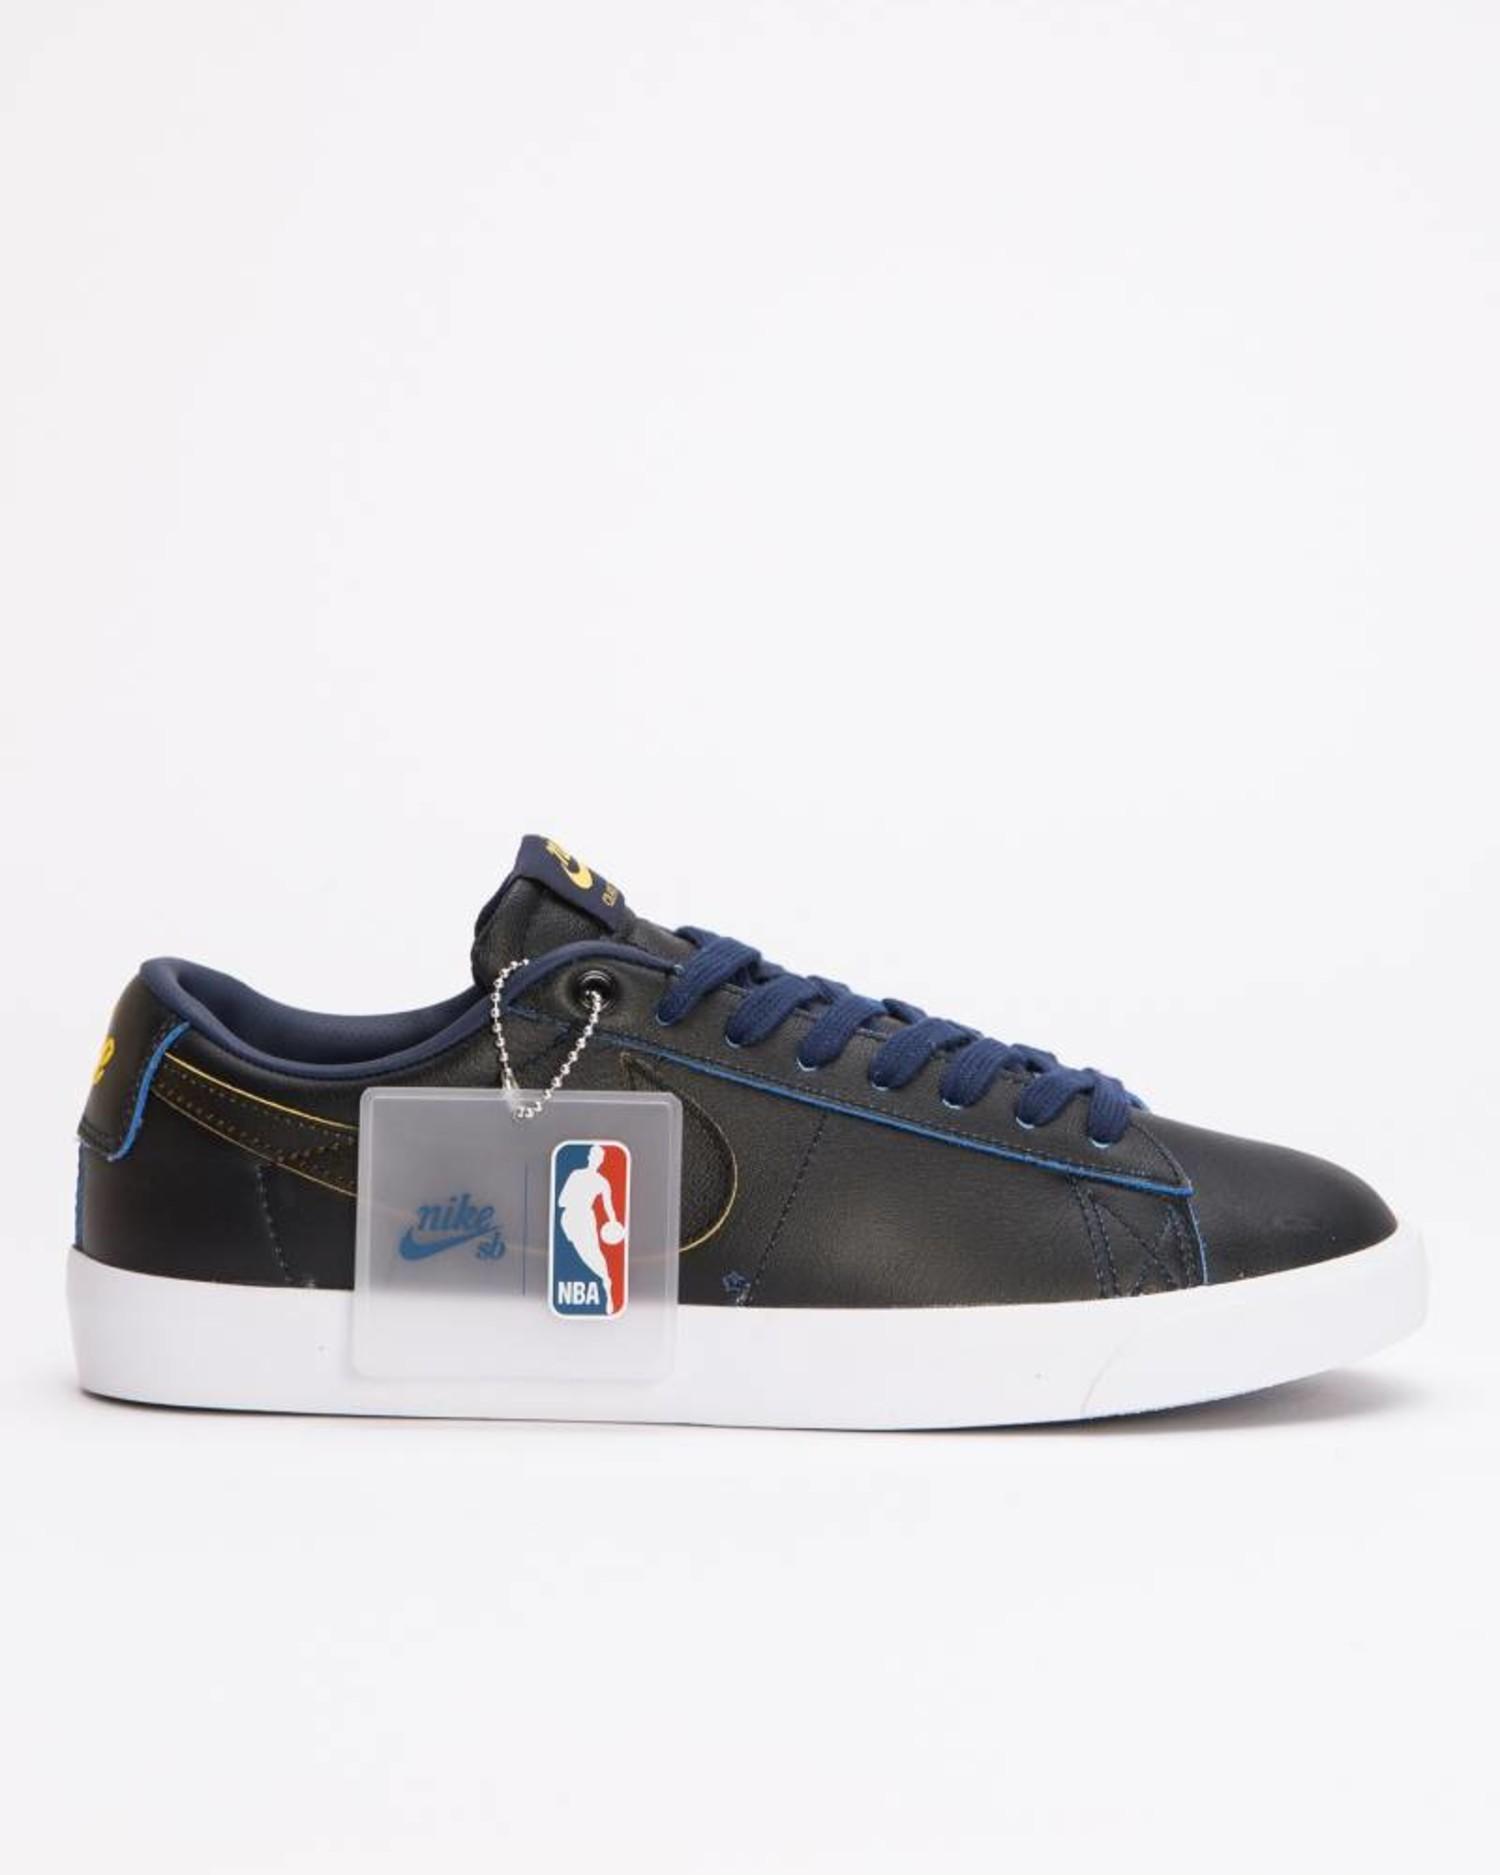 3d53f1acf975 Nike SB Zoom Blazer Low GT NBA Black/Black-Amarillo-Coast - Lockwood ...